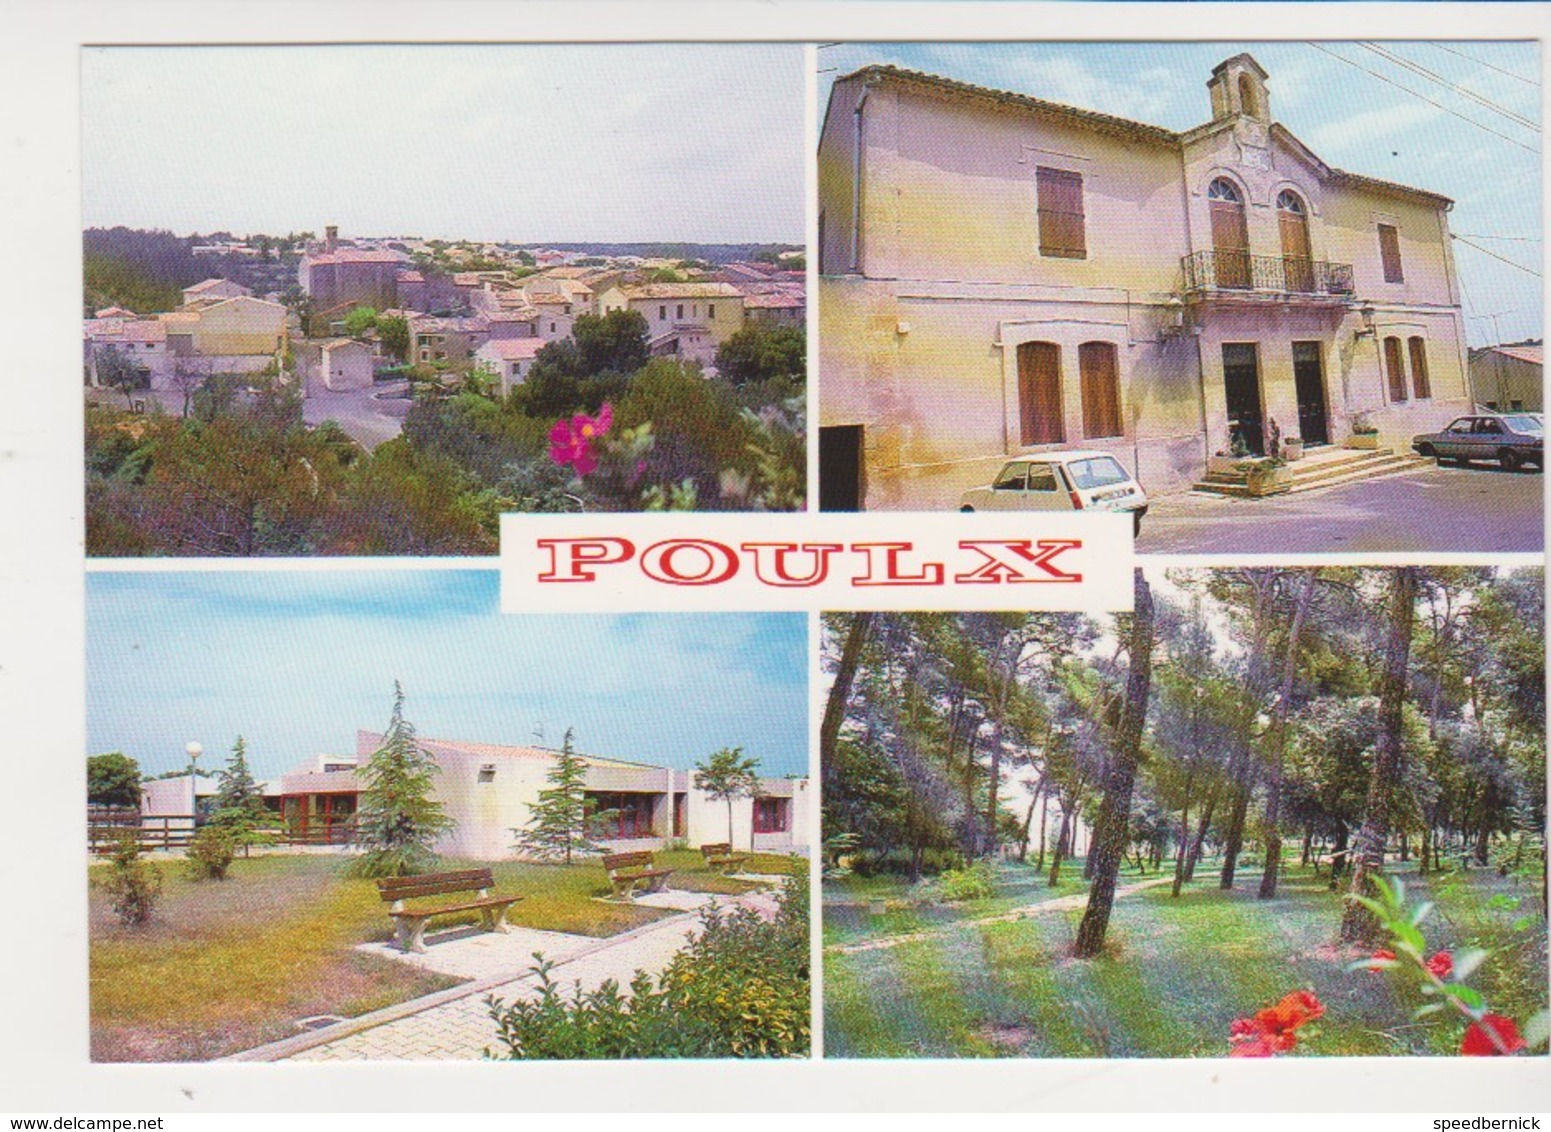 26594 POULX VUE GENERALE MAIRIE ECOLE PINEDE VUES MULTIPLES GARD  -Nlle Ed Provencales Photos A Nappi - - France